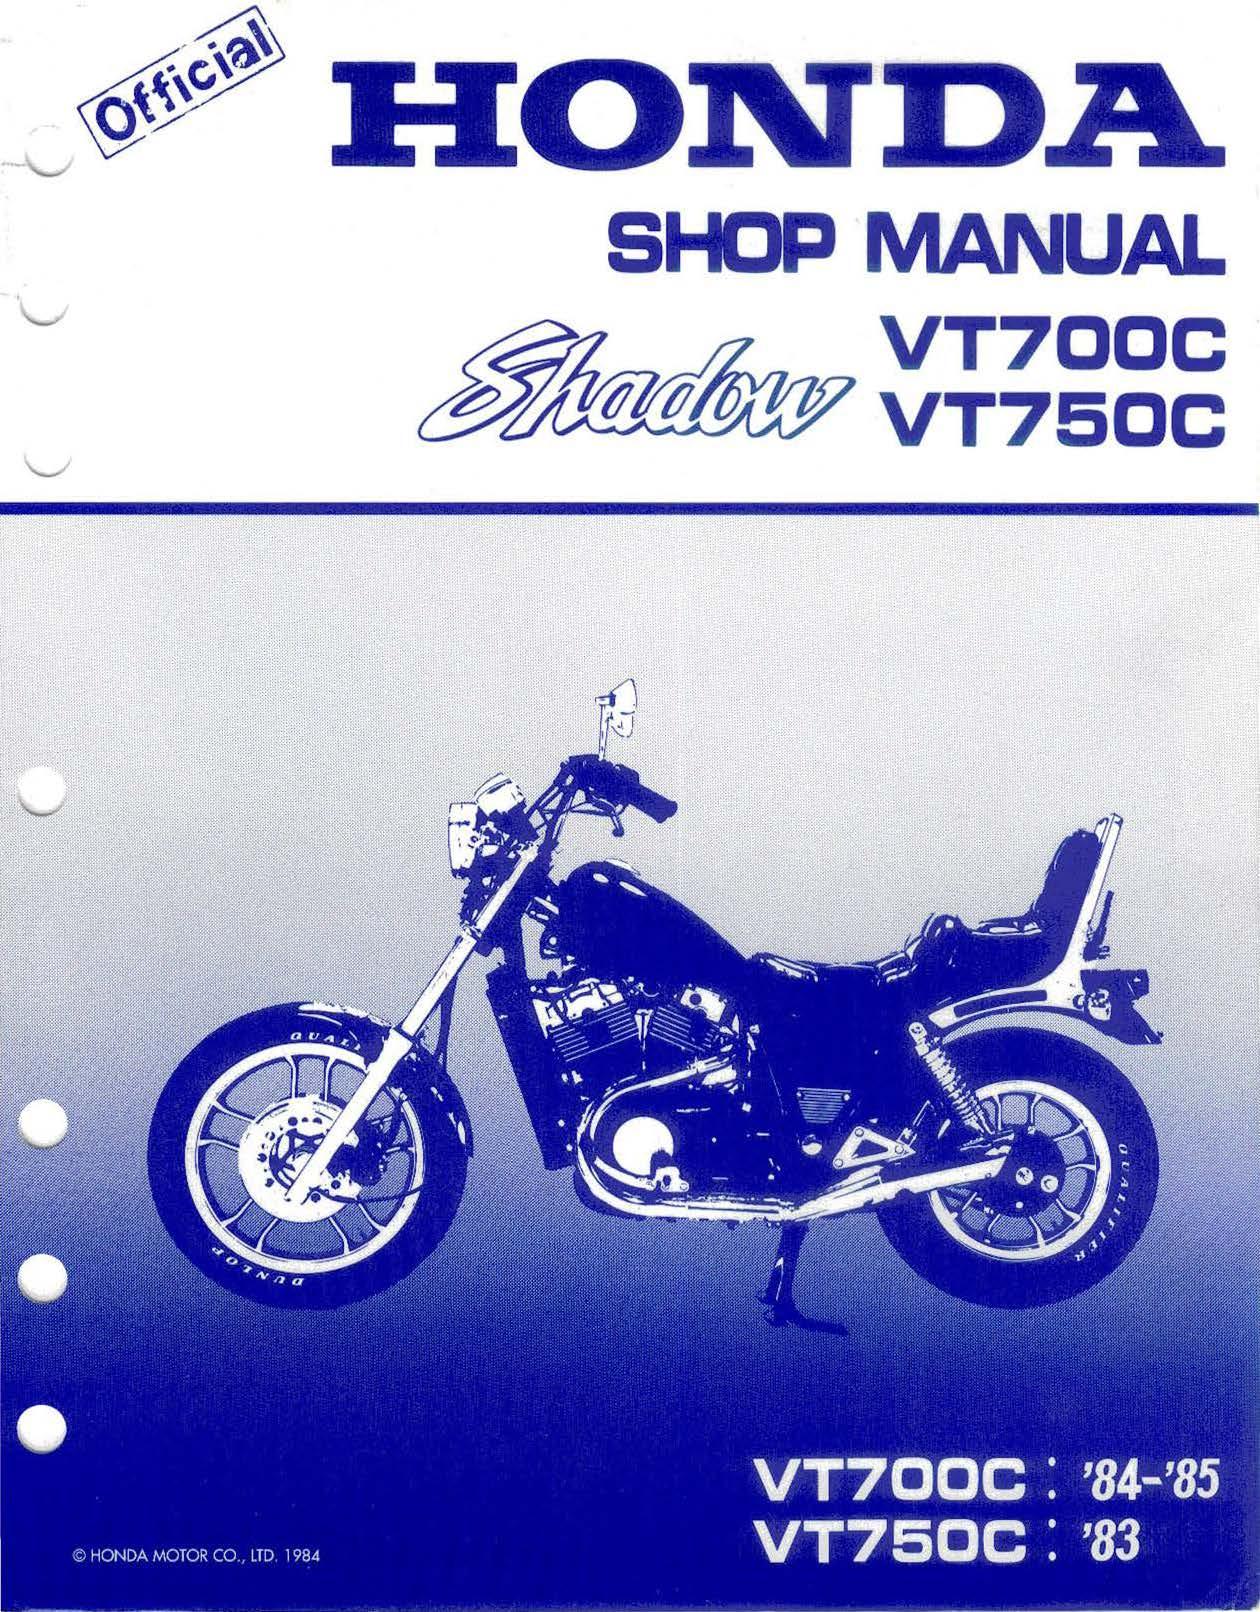 Workshop manual for Honda VT700C Shadow (1984-1985)